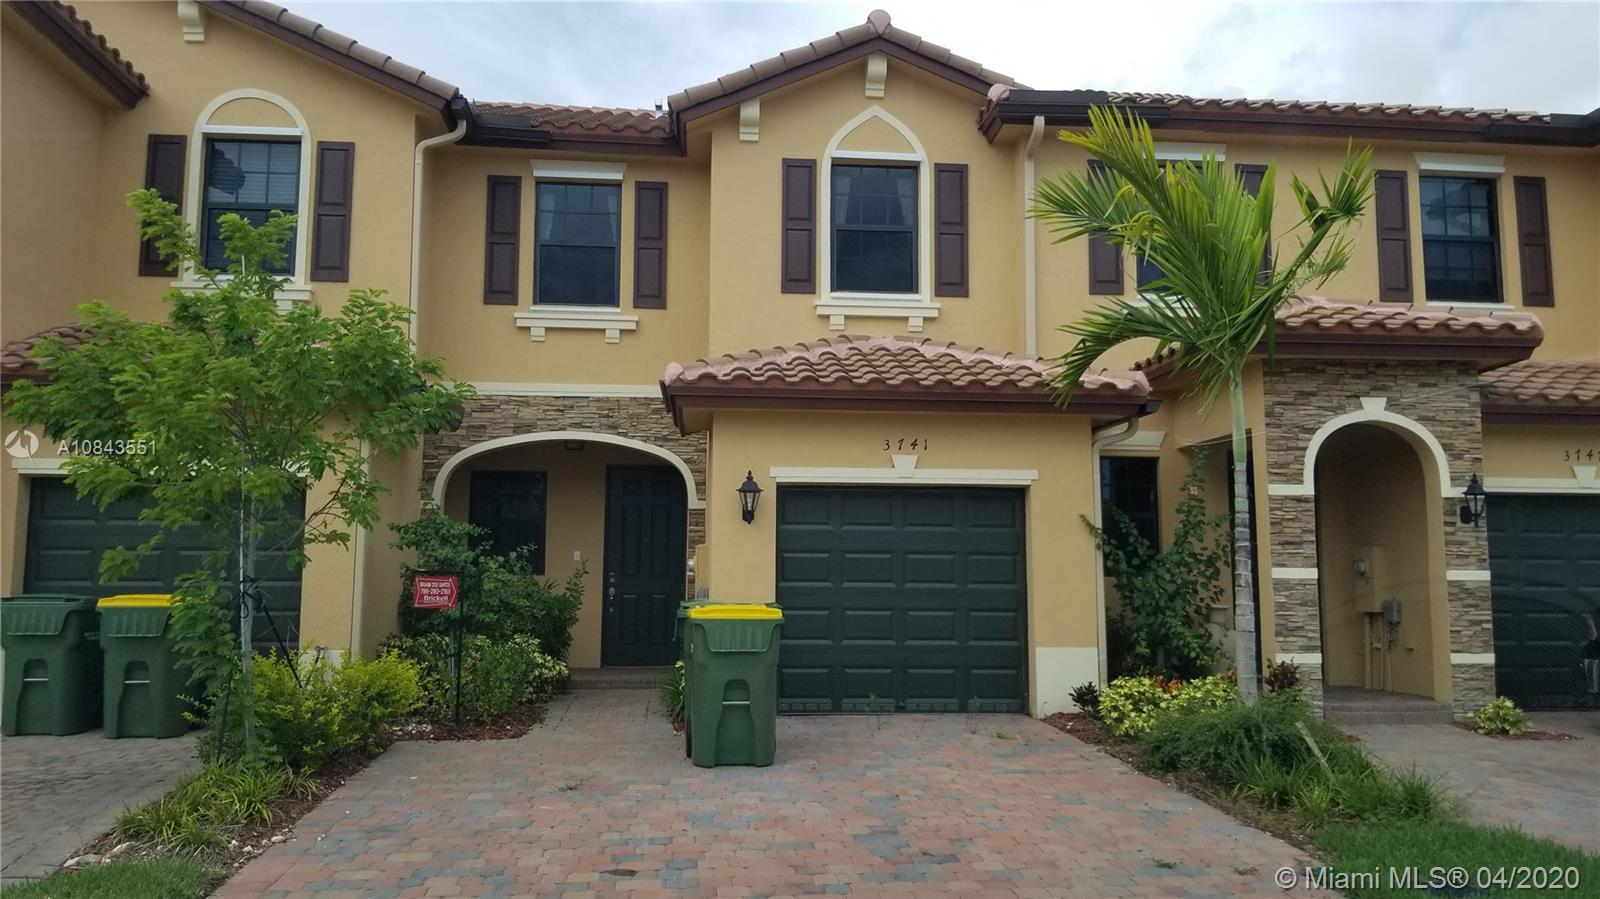 3741 SE 1st St #3741, Homestead, FL 33033 - Homestead, FL real estate listing